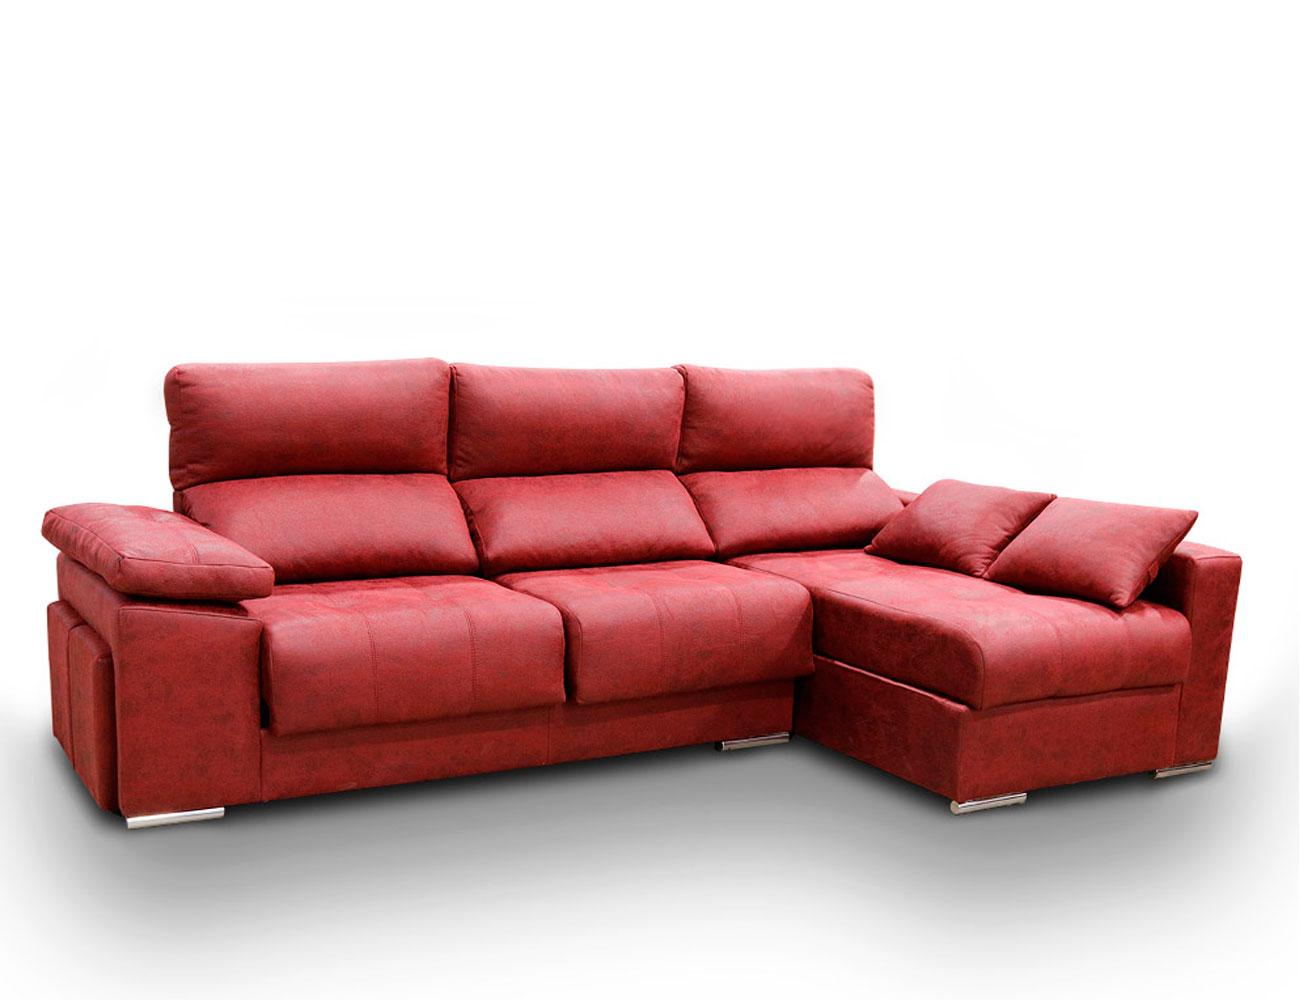 Sofa chaiselongue anti manchas rojo granate19